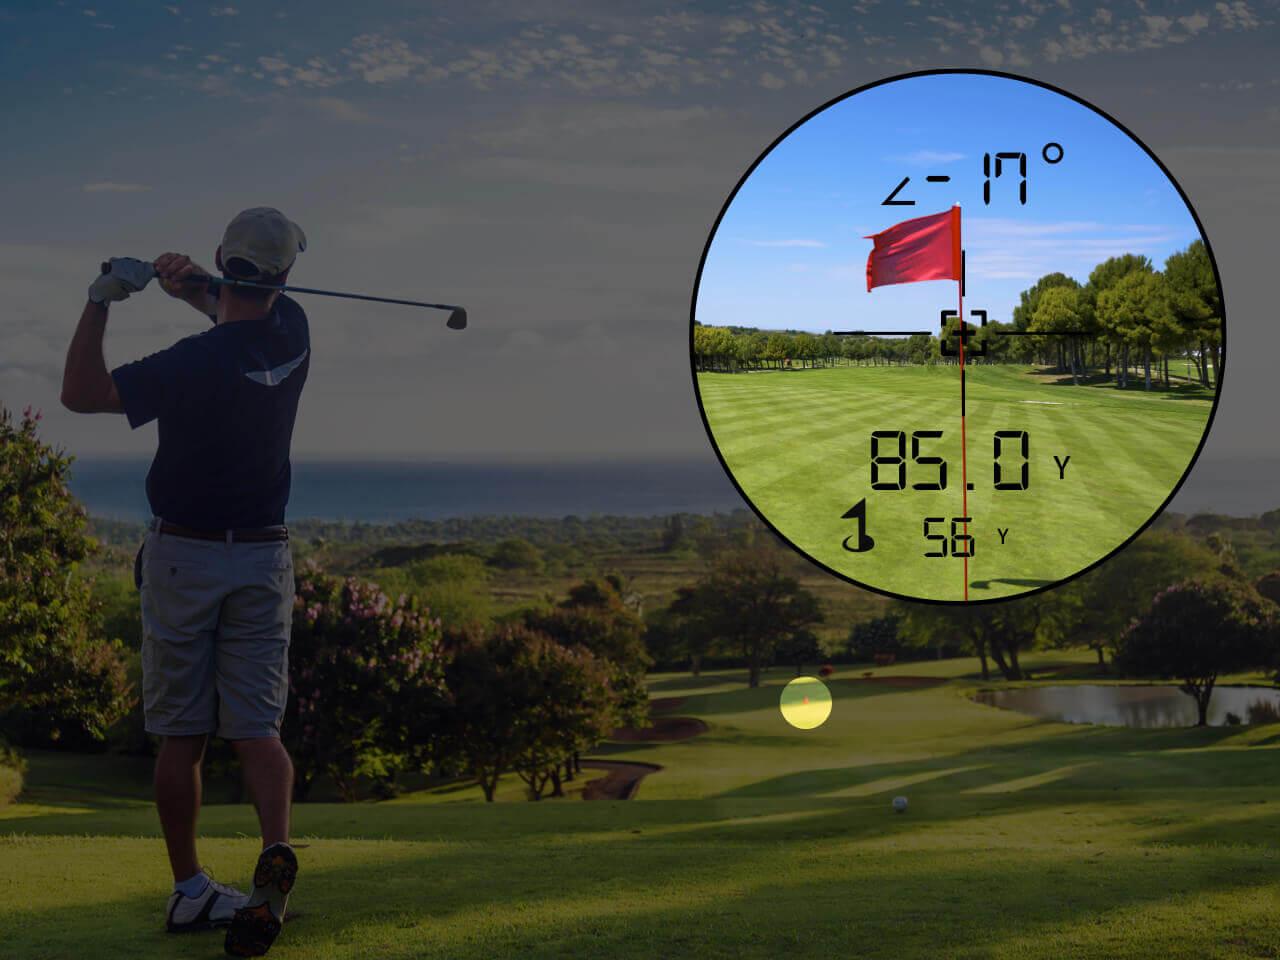 TecTecTec Golf Rangefinder PinSlope Technology